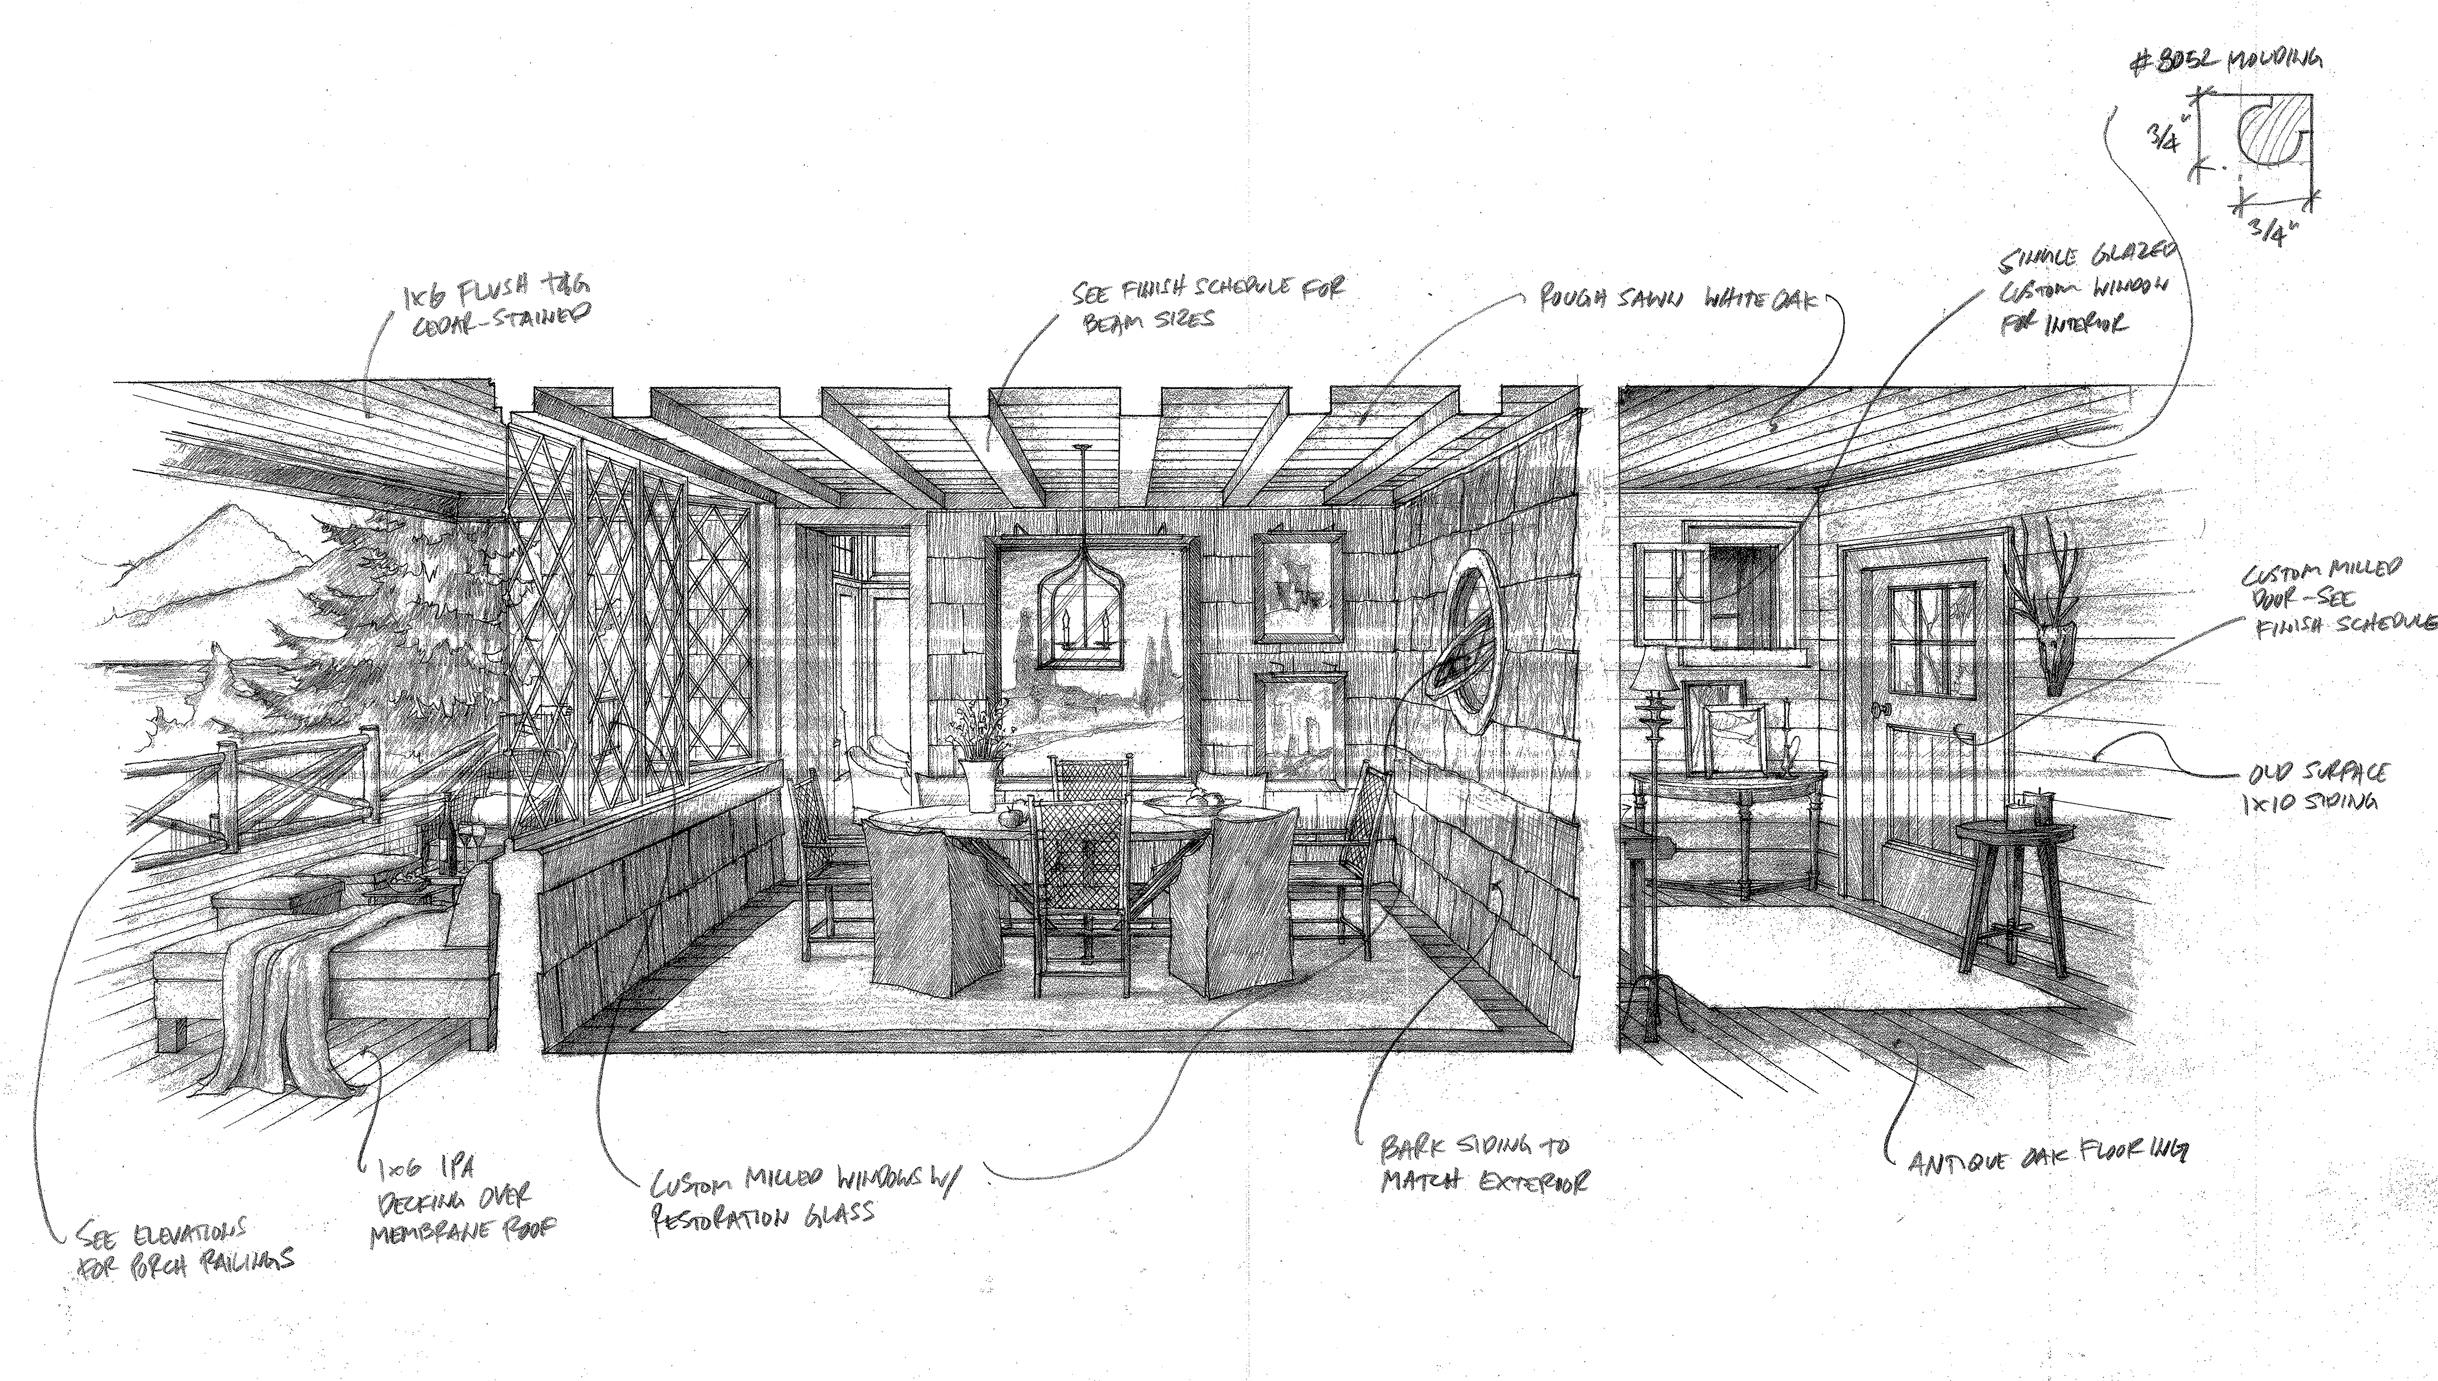 Lake_Placid.New_York.Lake_House.Robert_Orr_&_Associates.Architecture.Landscape_Architecture.Urbanism.Camp.Dining_Room_Perspective.Mark_Kline_Del.Pursley_Dixon.jpg